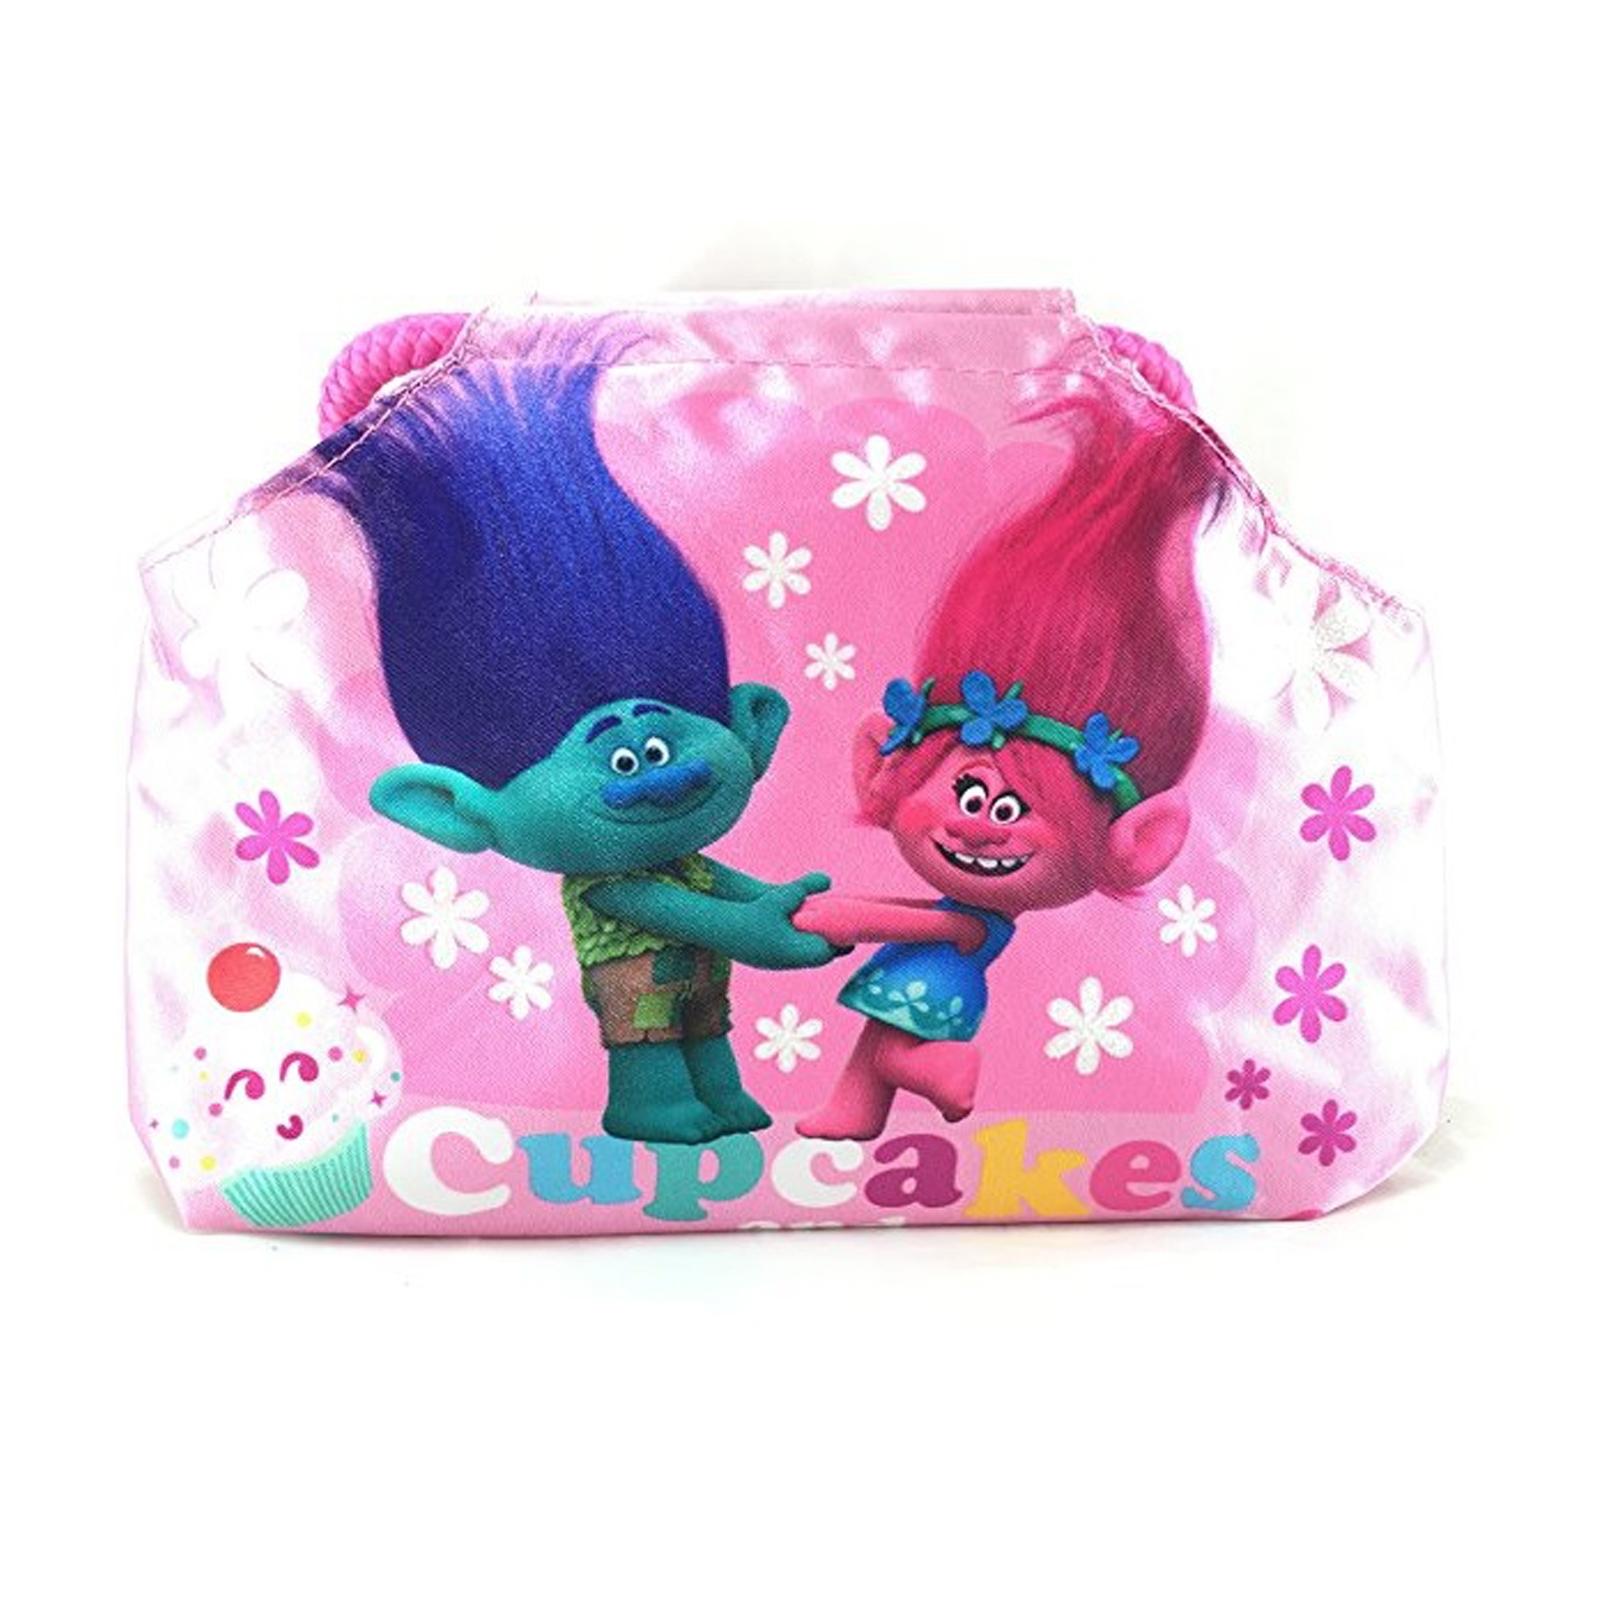 Dreamworks Trolls Cupcakes Girl's Dress Up Accessory Purse - Poppy and Guy Diamond